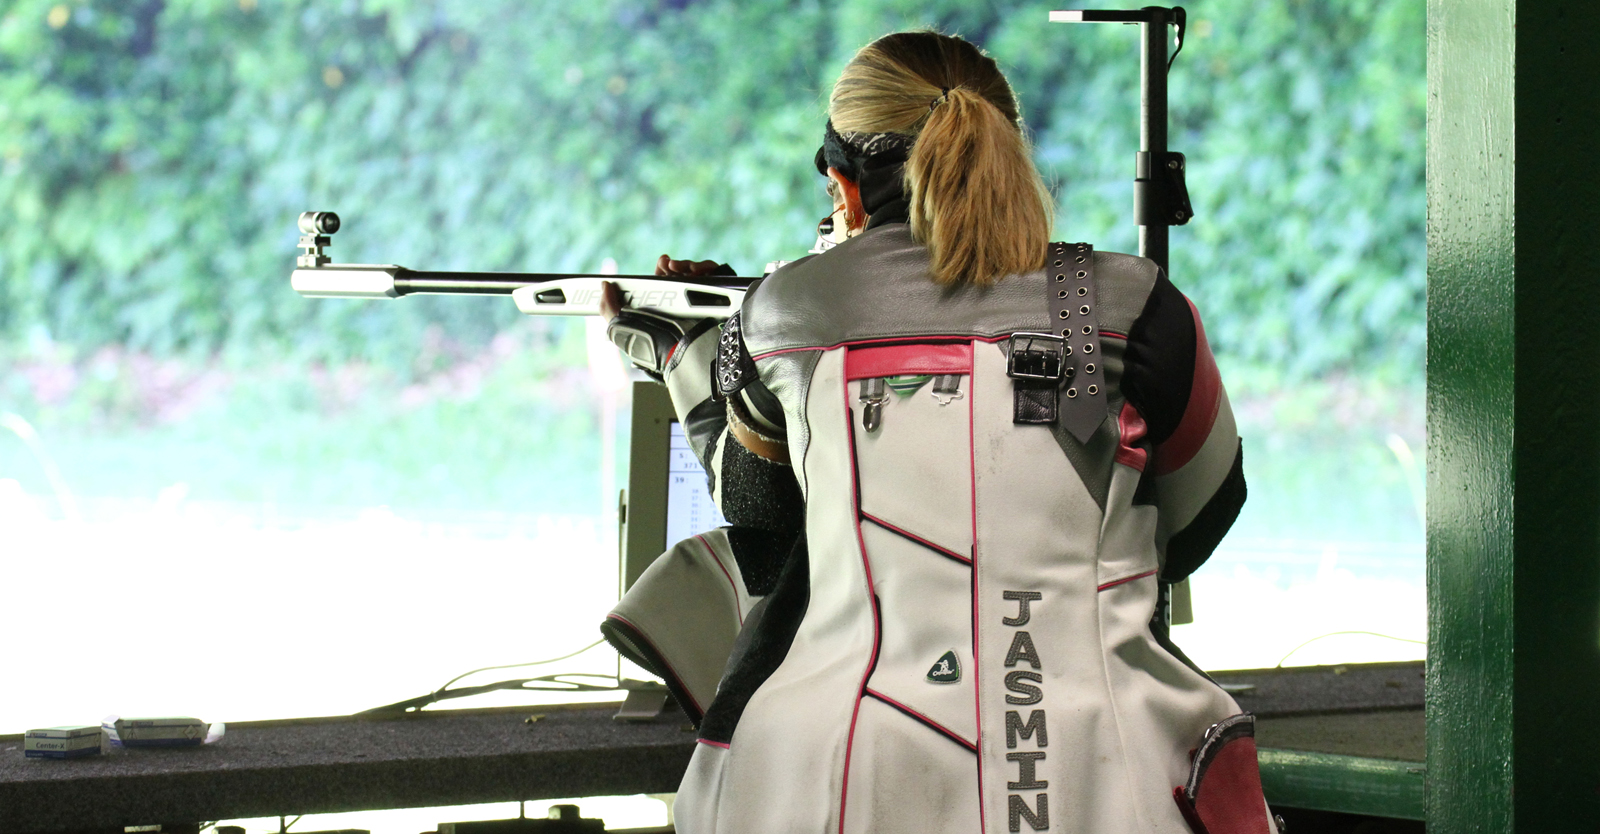 Jasmin Kitzbichler siegte im KK-Dreistellungsmatch der Rifle Trophy Innsbruck © Tina Neururer, ÖSB